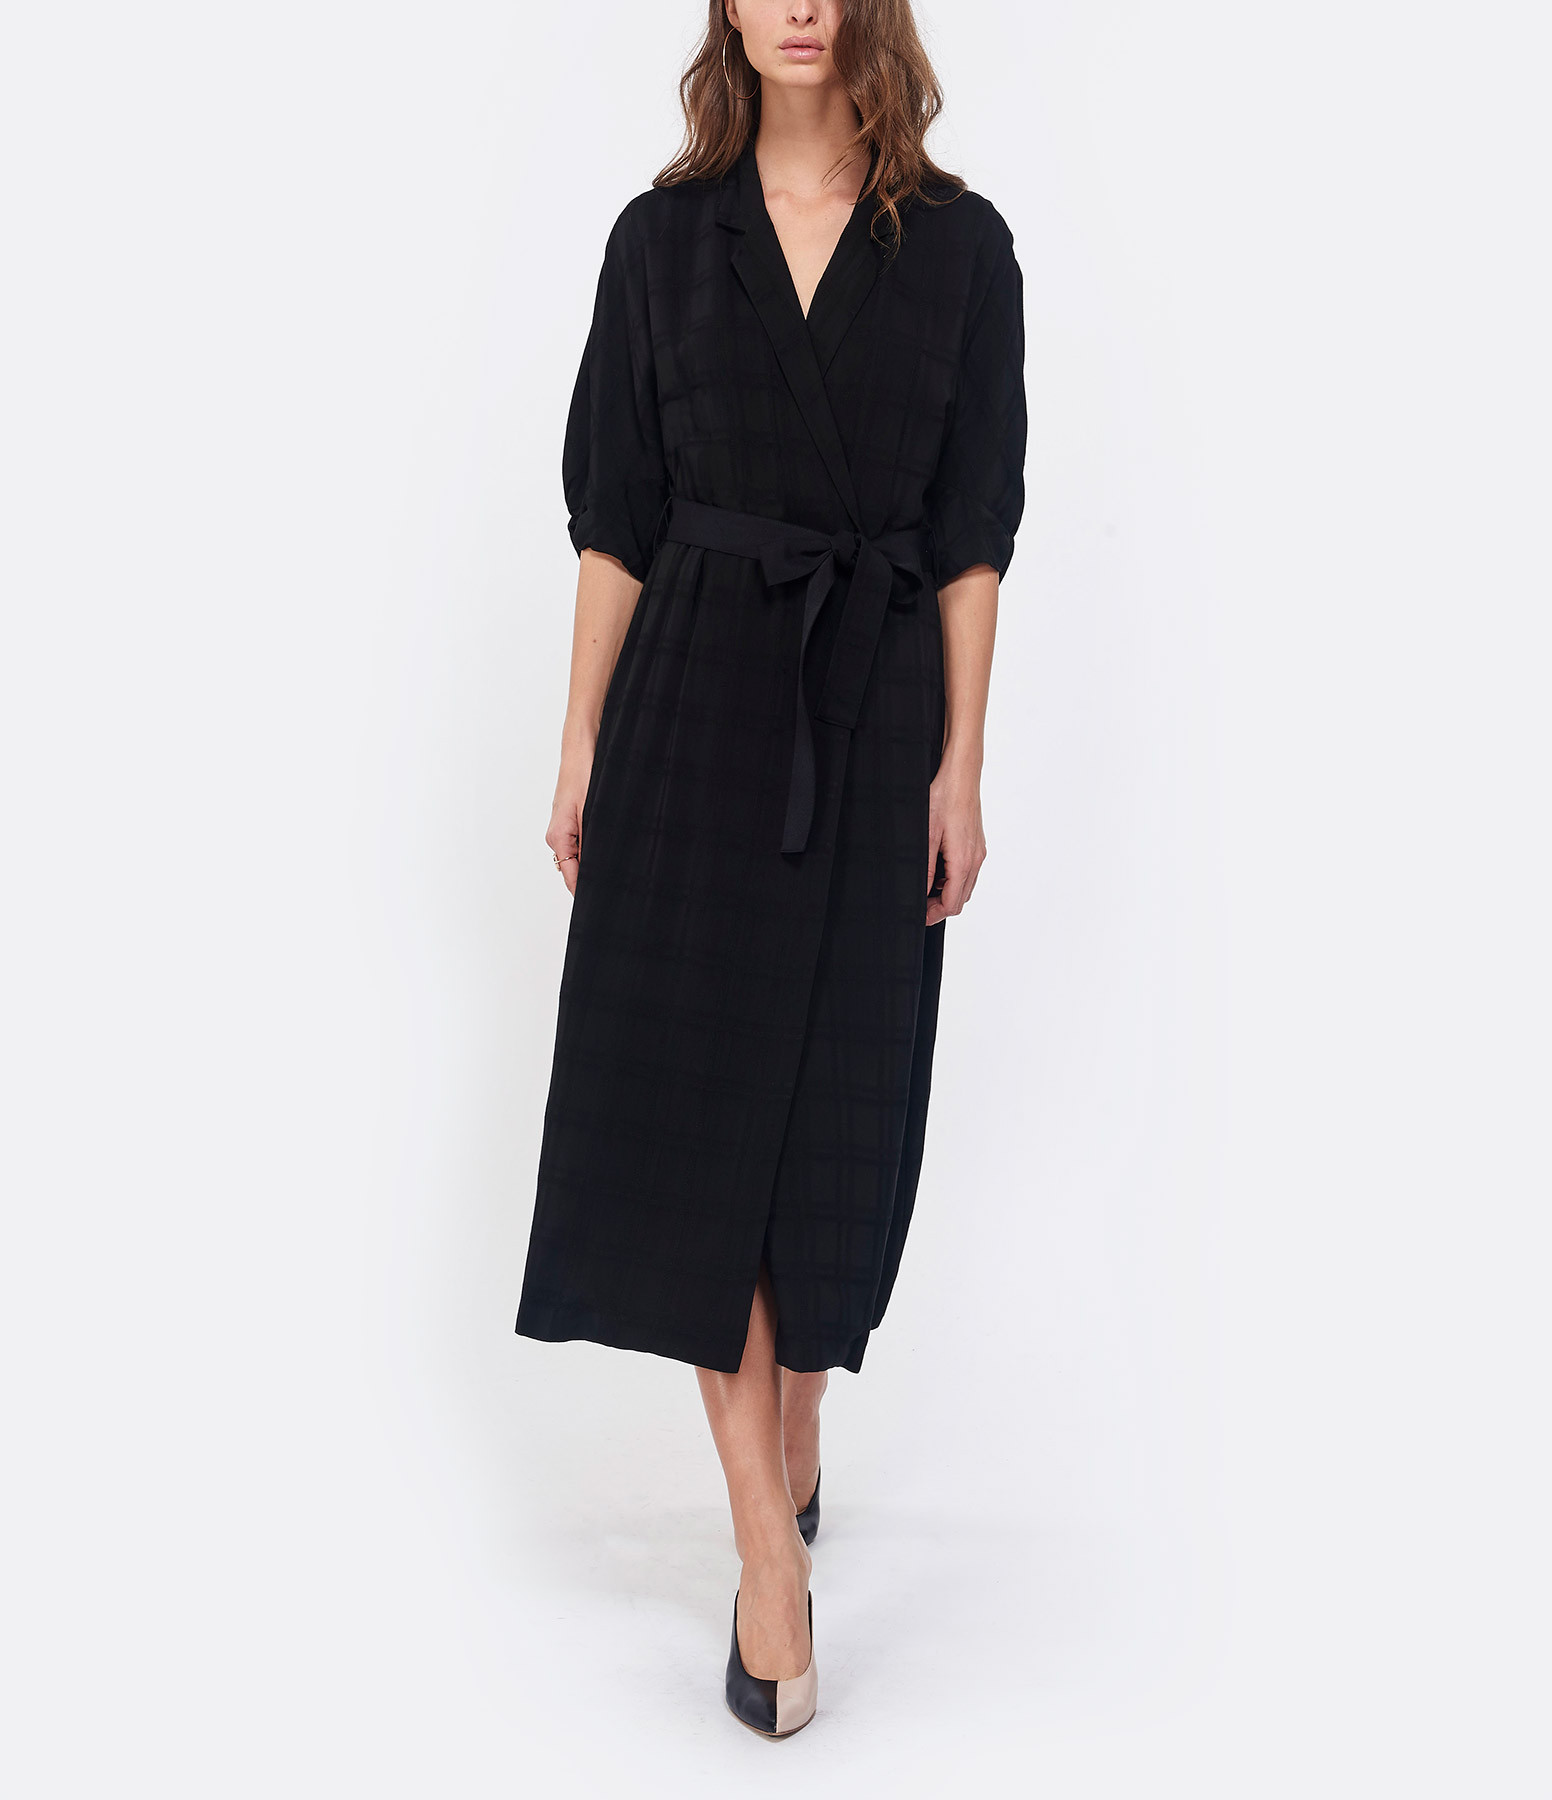 EQUIPMENT - Robe Anitone Noir